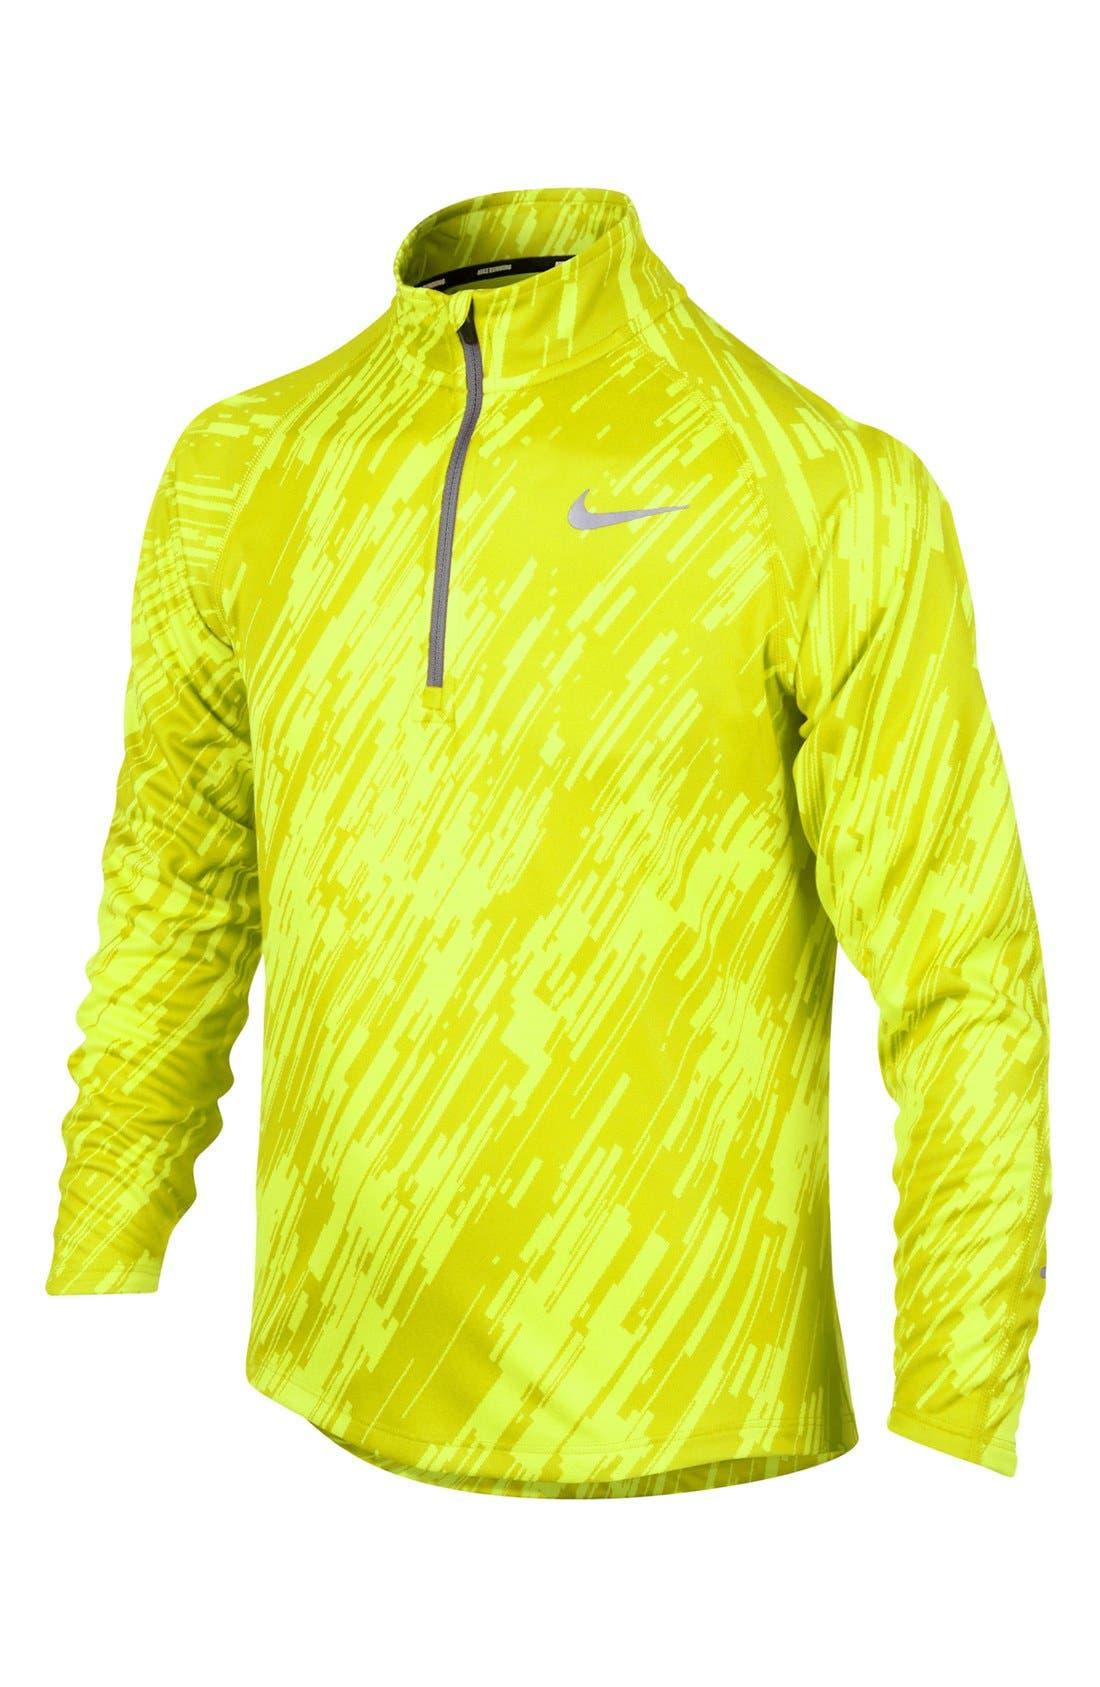 Main Image - Nike 'Element' Jacquard Half Zip Running Top (Big Boys)